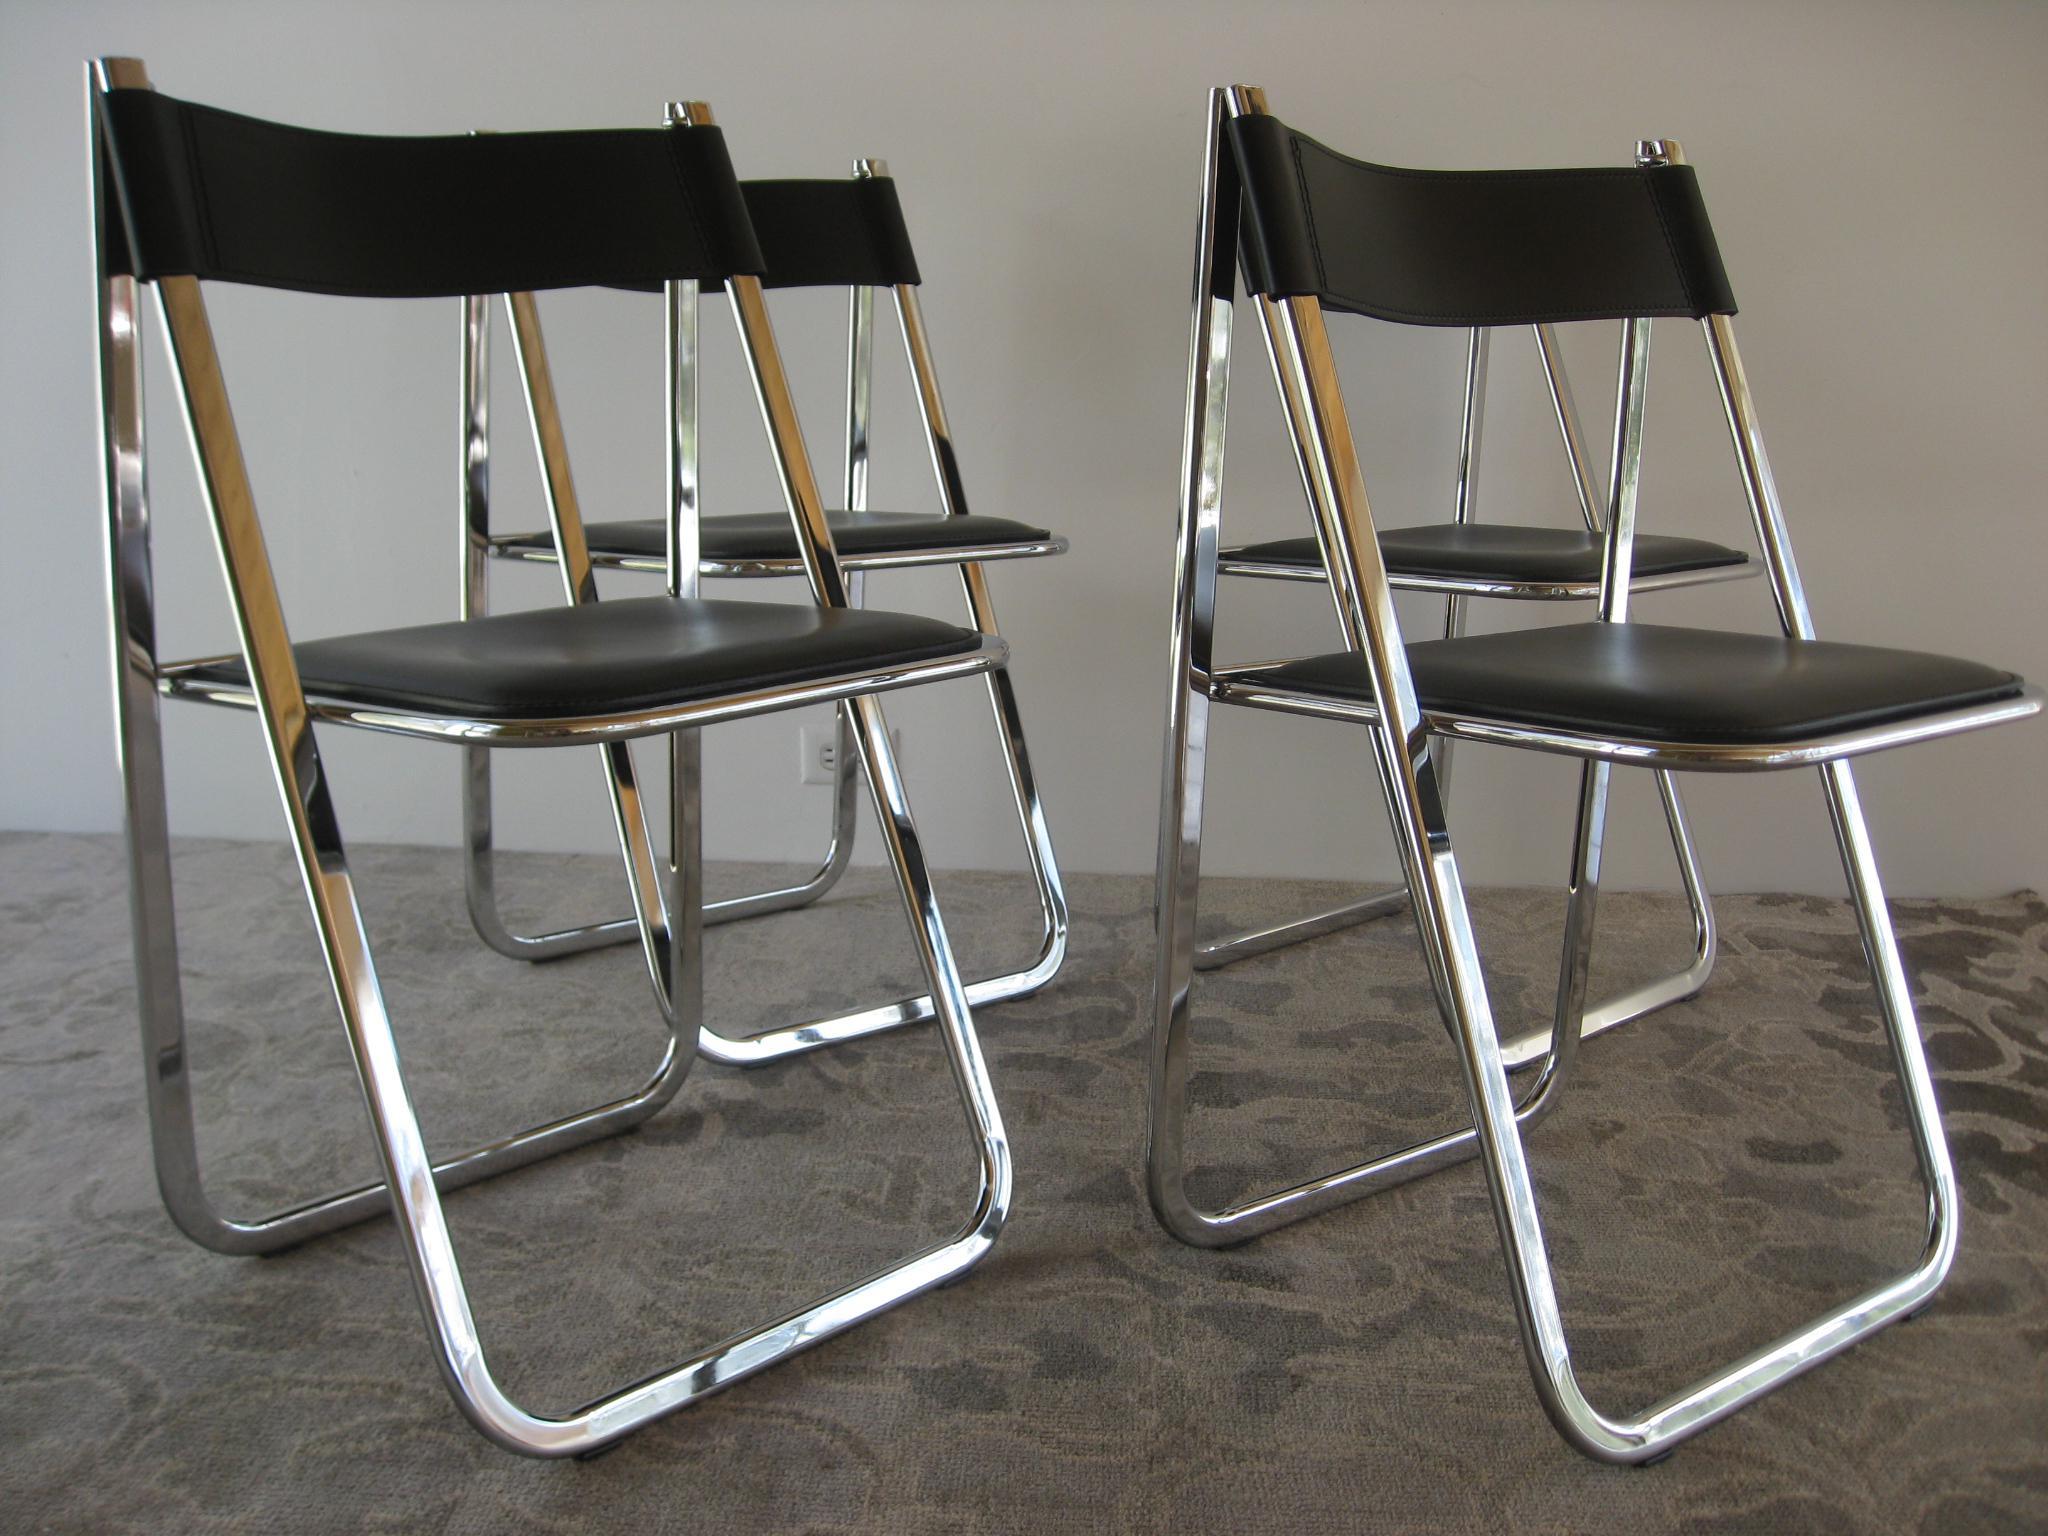 Arrben Tamara Italian Folding Chairs   Set Of 4   Image 3 Of 11